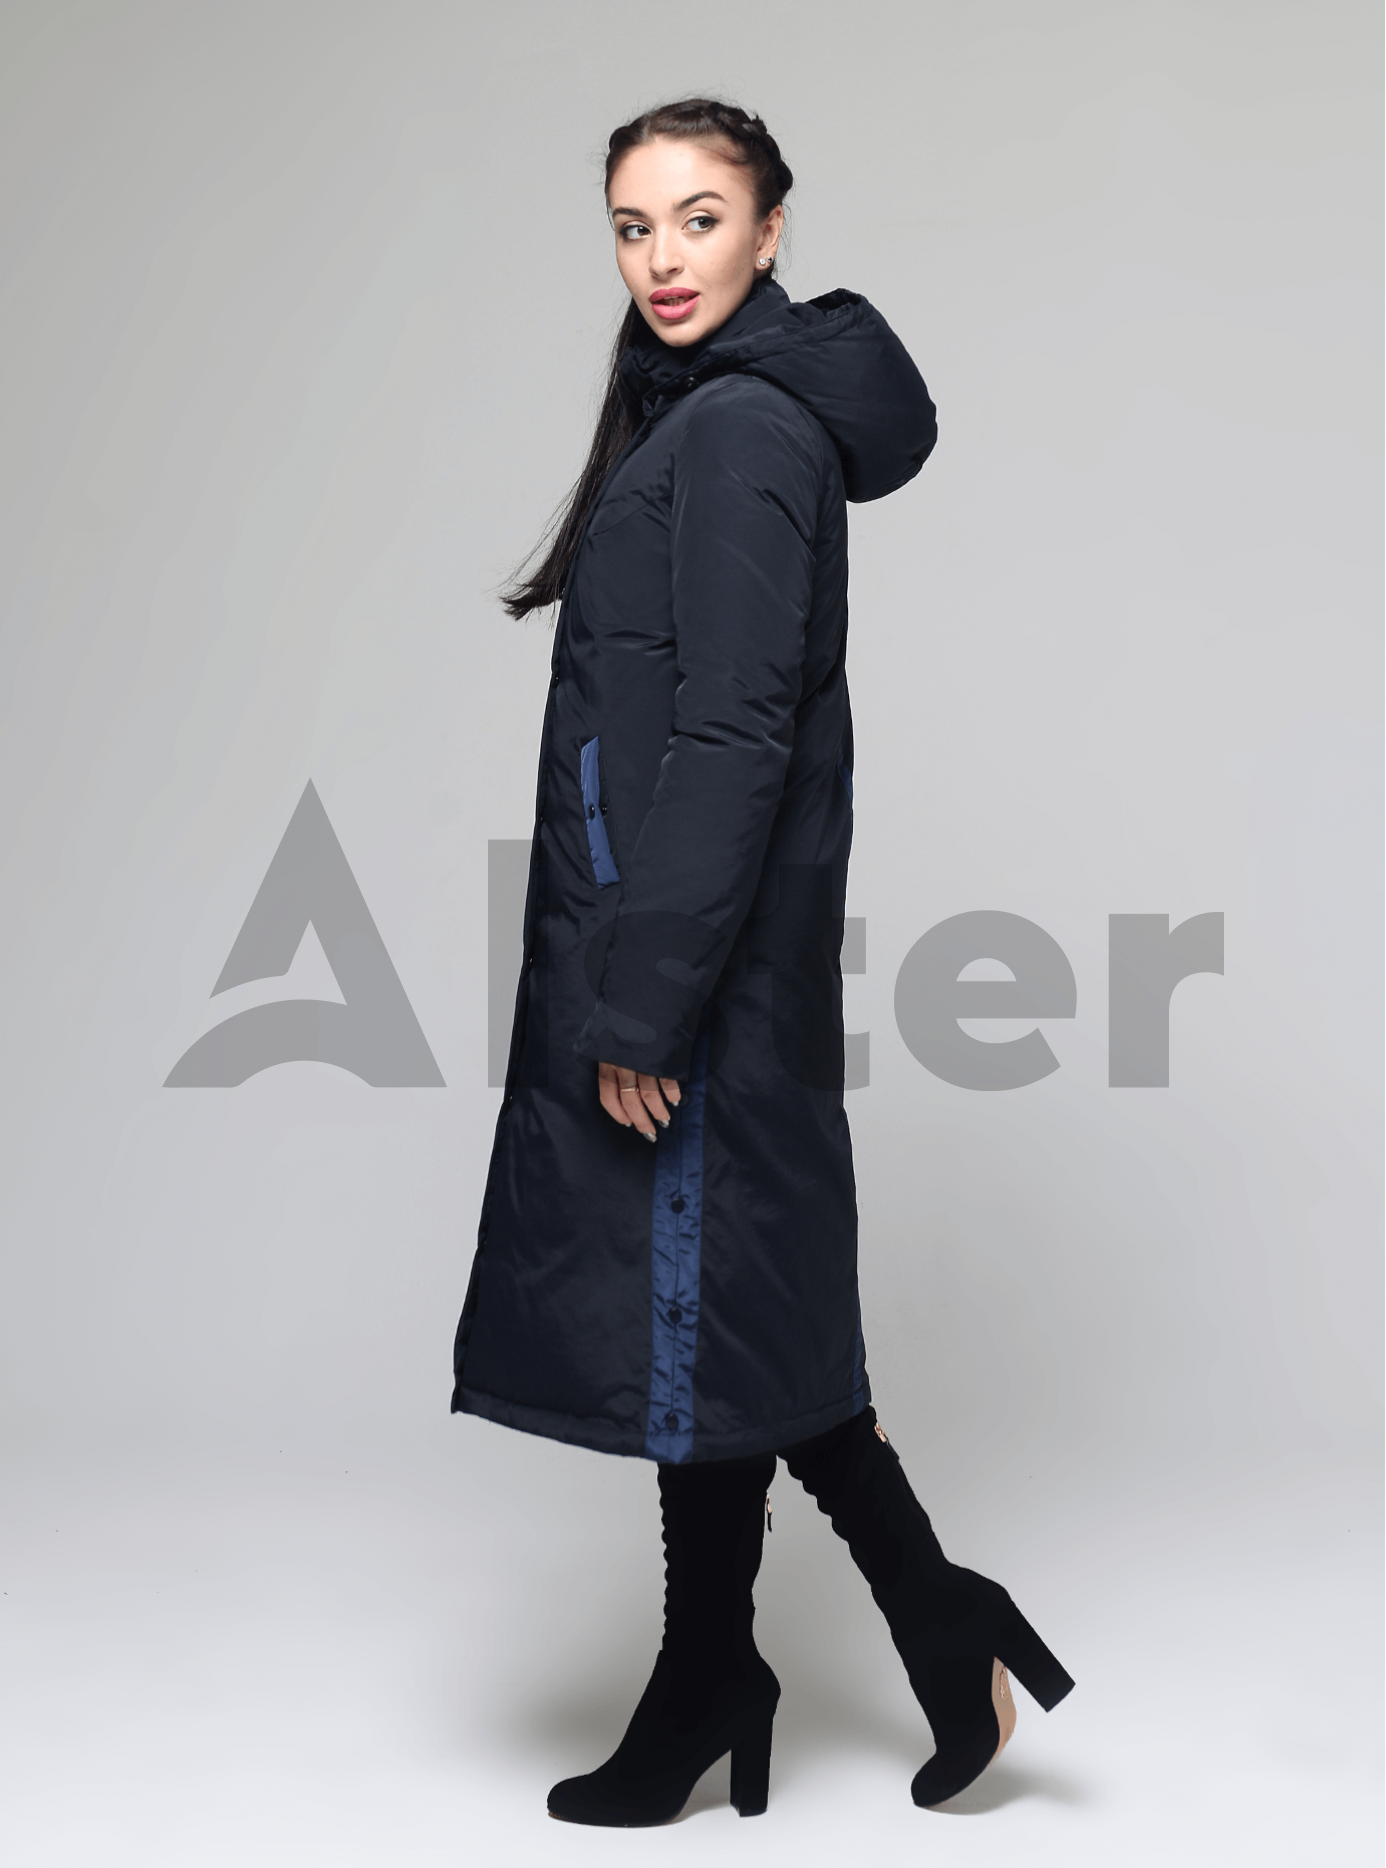 Пуховик зимний прямой с капюшоном Тёмно-синий S (04-CC19041): фото - Alster.ua